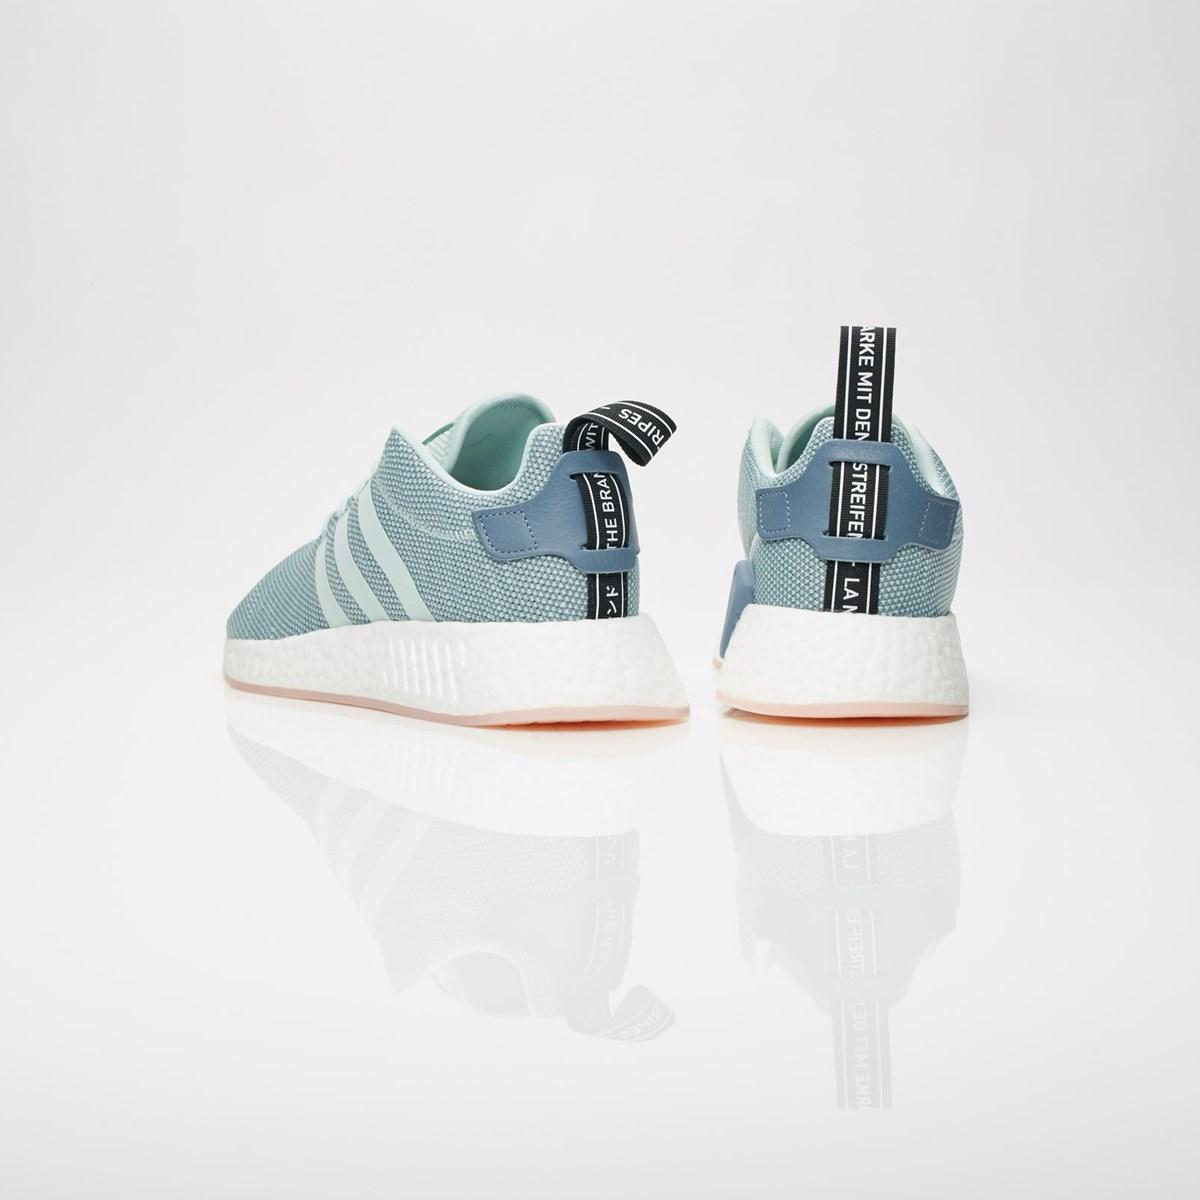 cc10a5b6a adidas NMD R2 W - Cq2010 - Sneakersnstuff